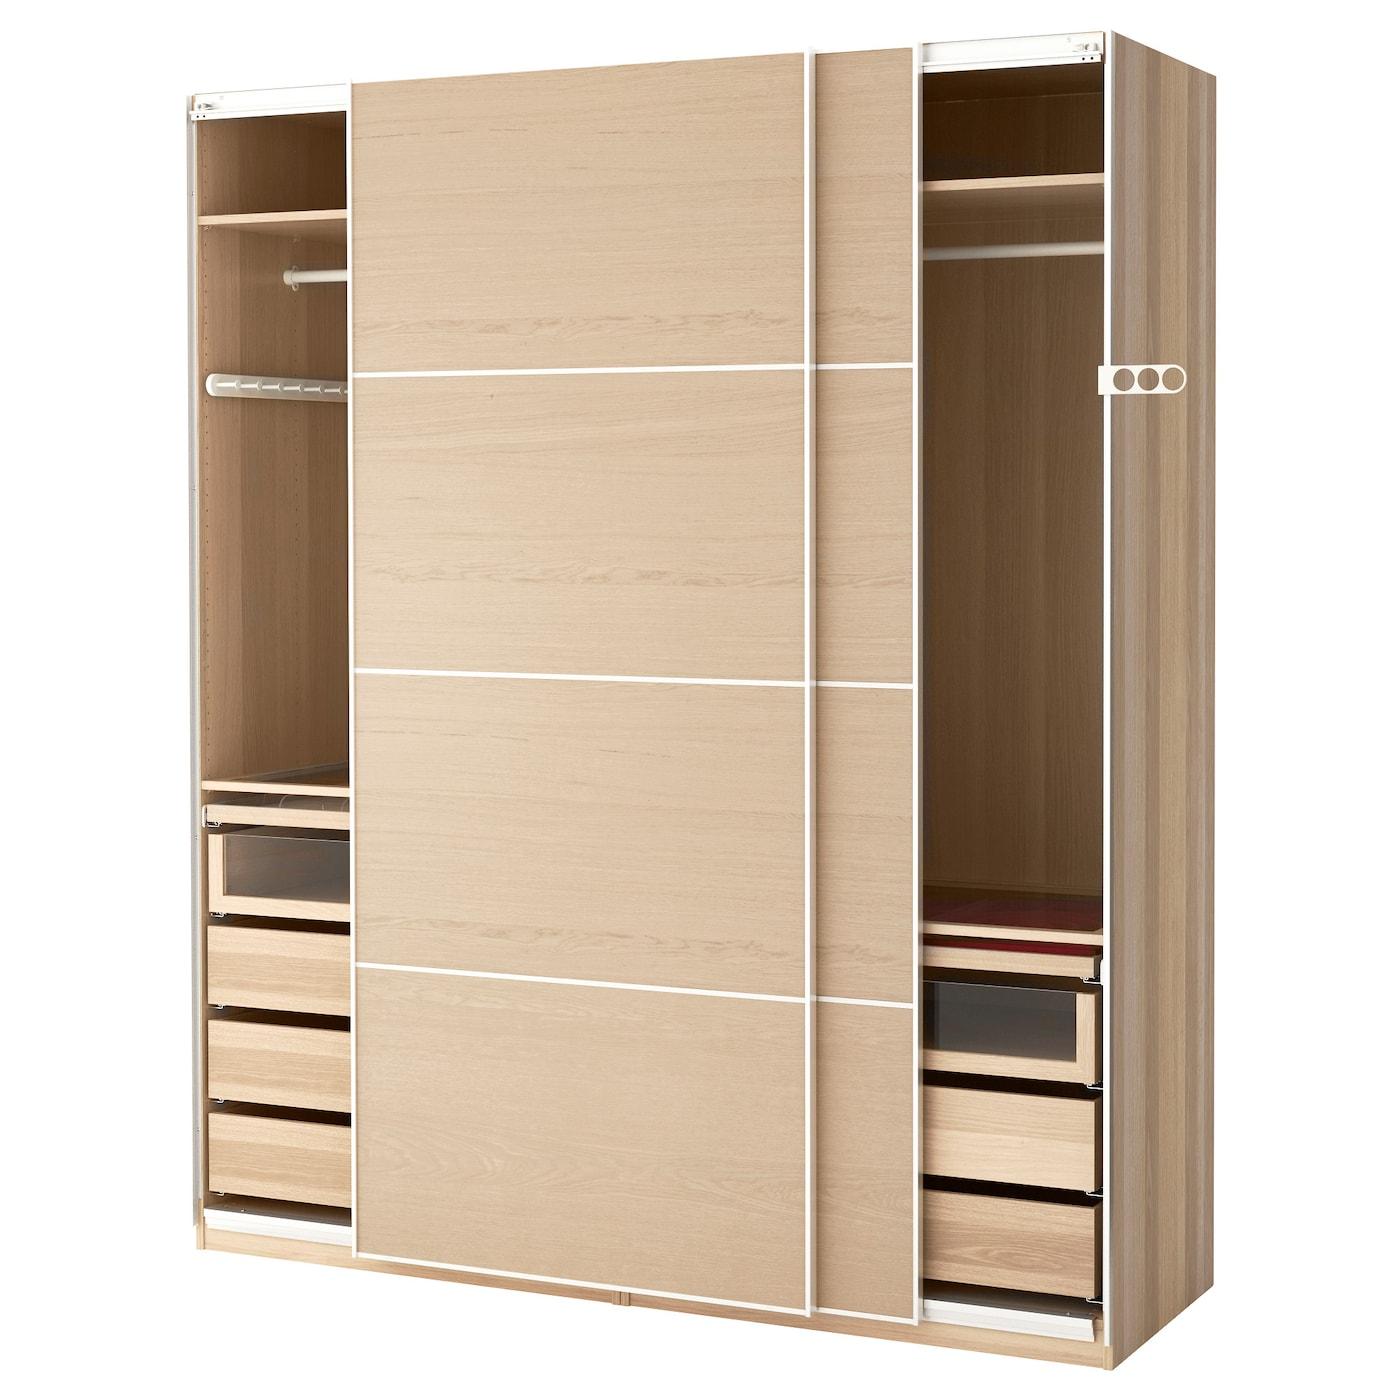 pax wardrobe white stained oak effect ilseng white stained oak veneer 200x66x236 cm ikea. Black Bedroom Furniture Sets. Home Design Ideas